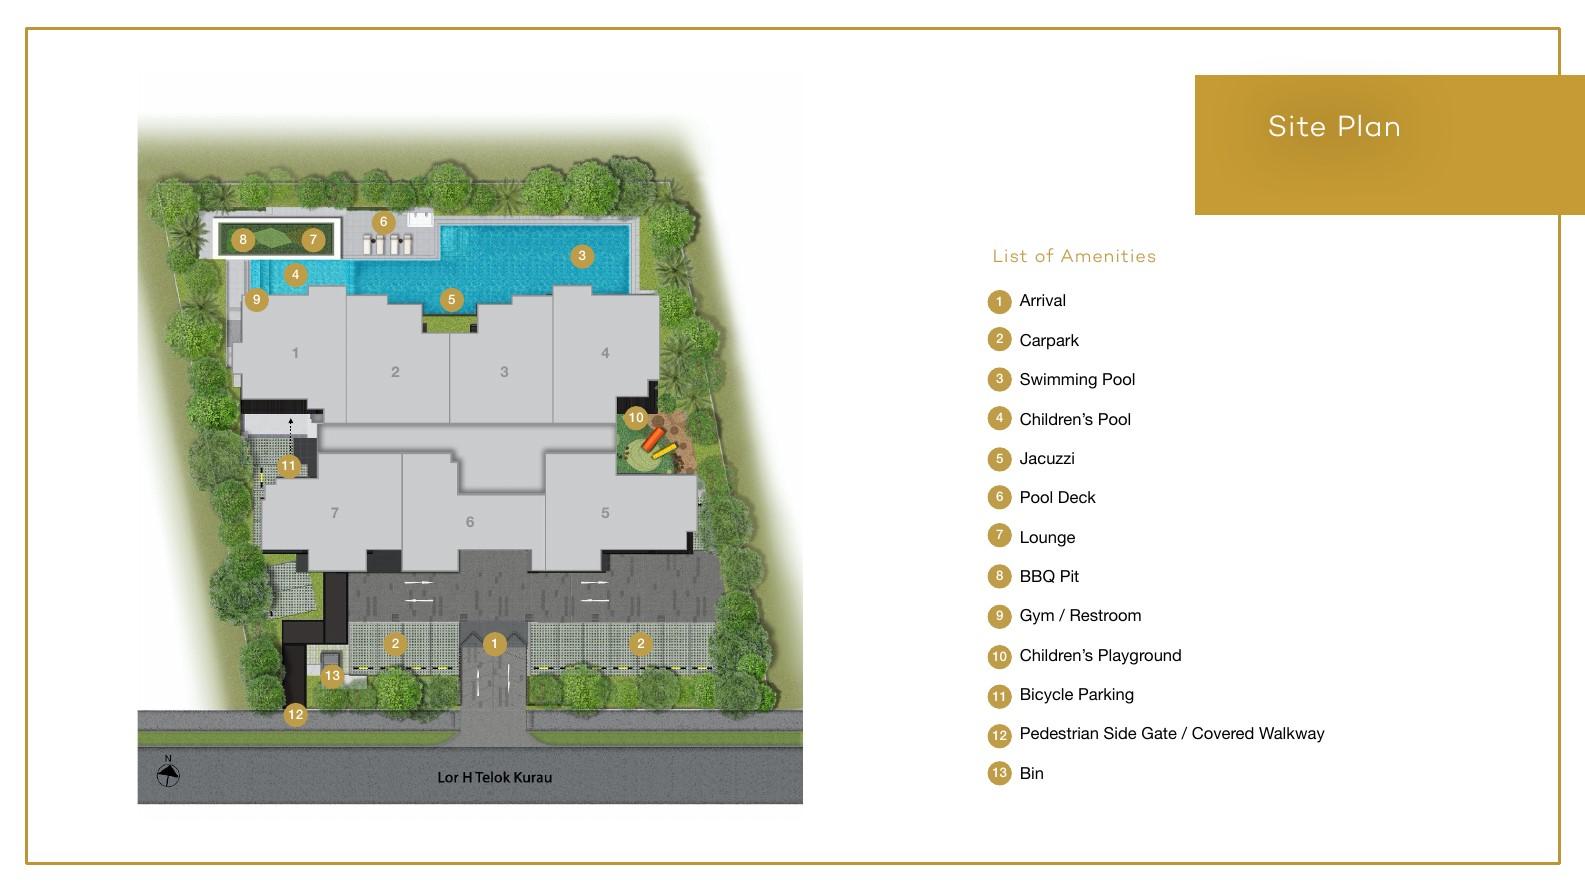 Rymden-77-new-condo-singapore-site-plan